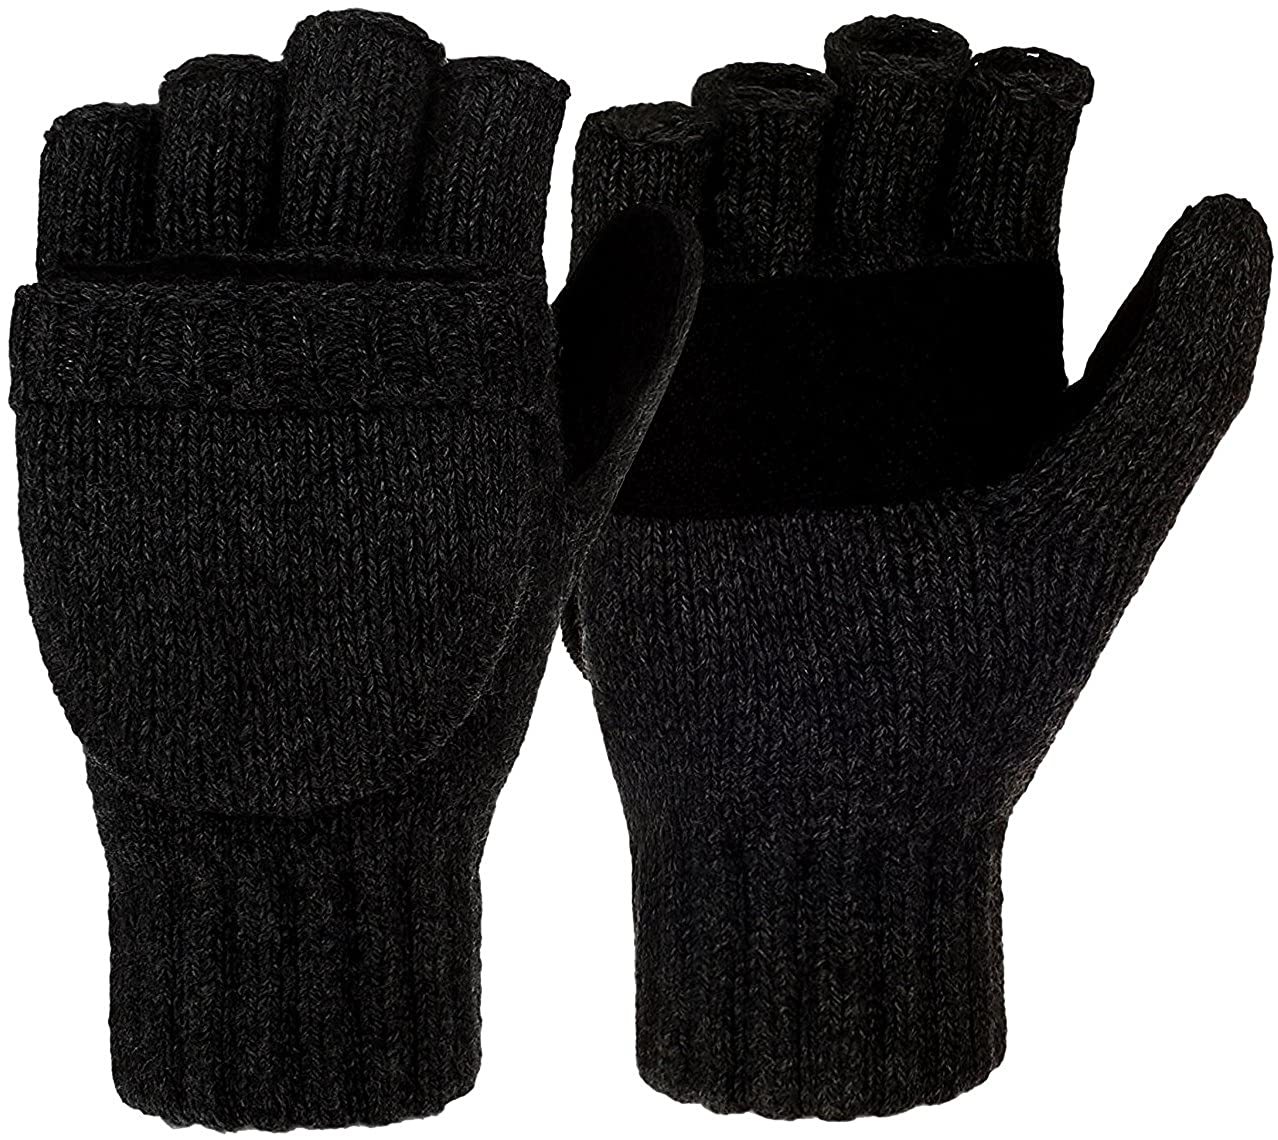 Korlon Winter Warm Wool Knitted Convertible Gloves Mittens with Mitten Cover Black CLN-007-1